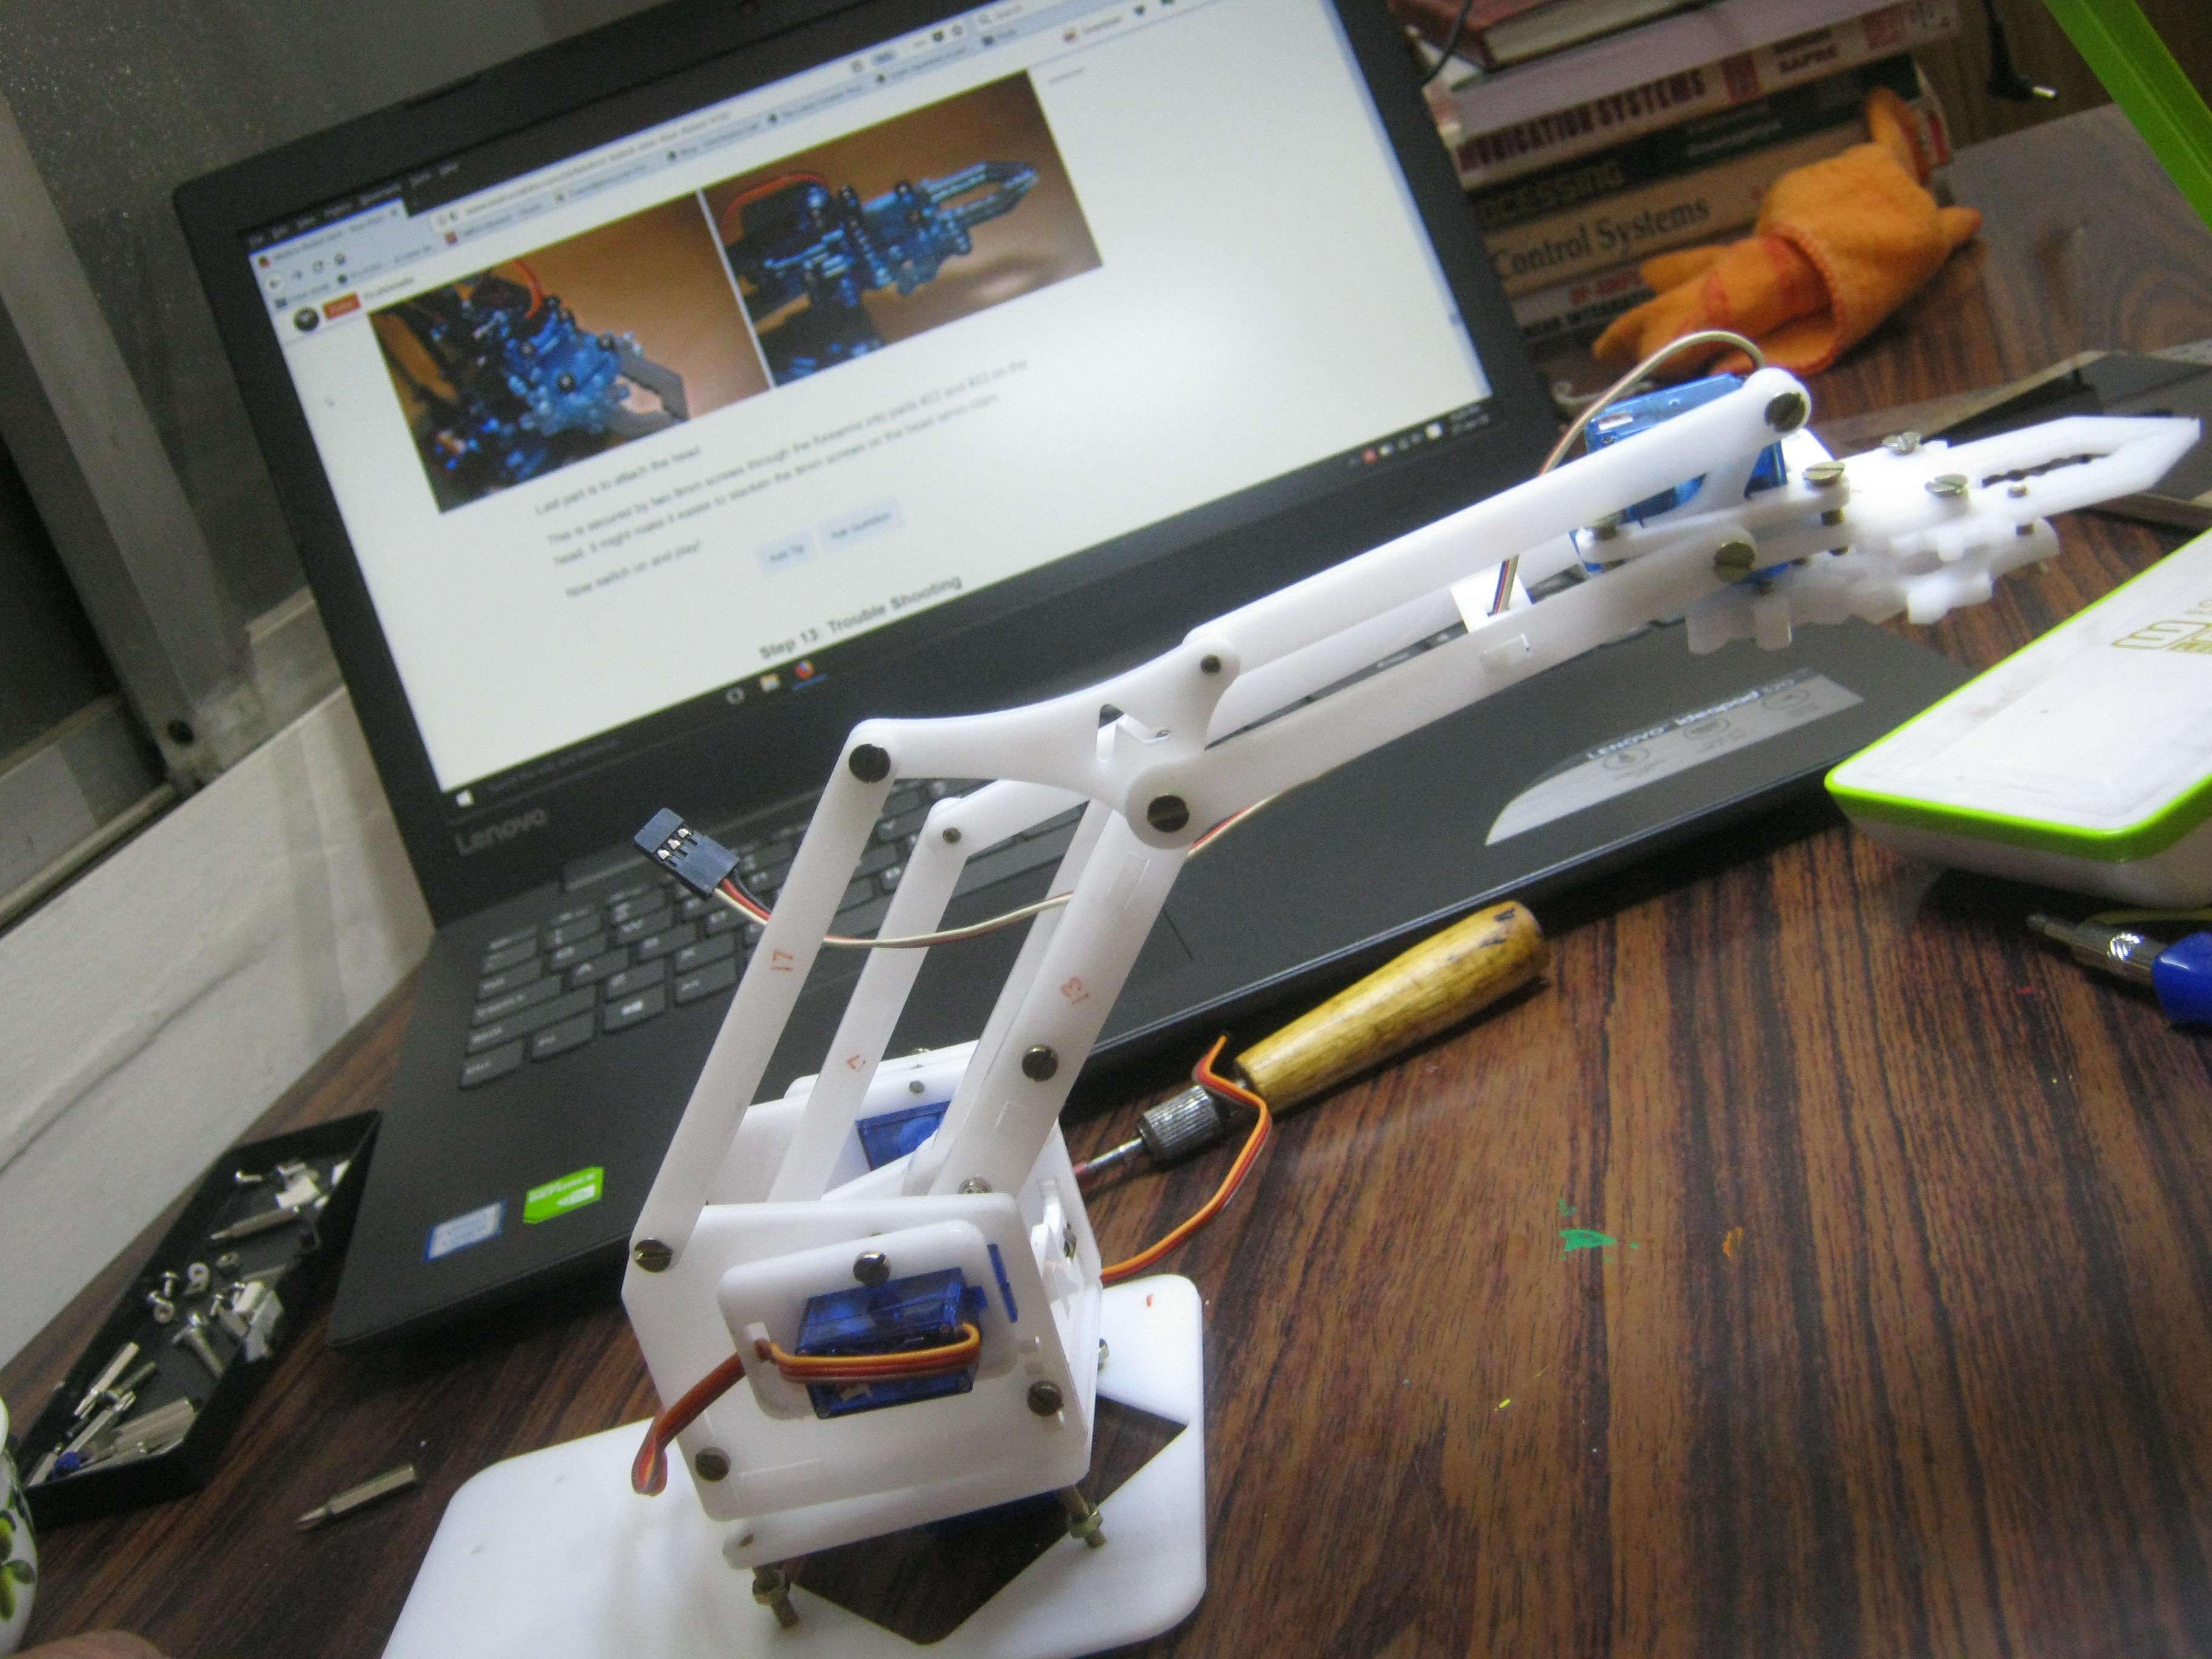 MeArm Robot Arm - Your Robot - V1.0